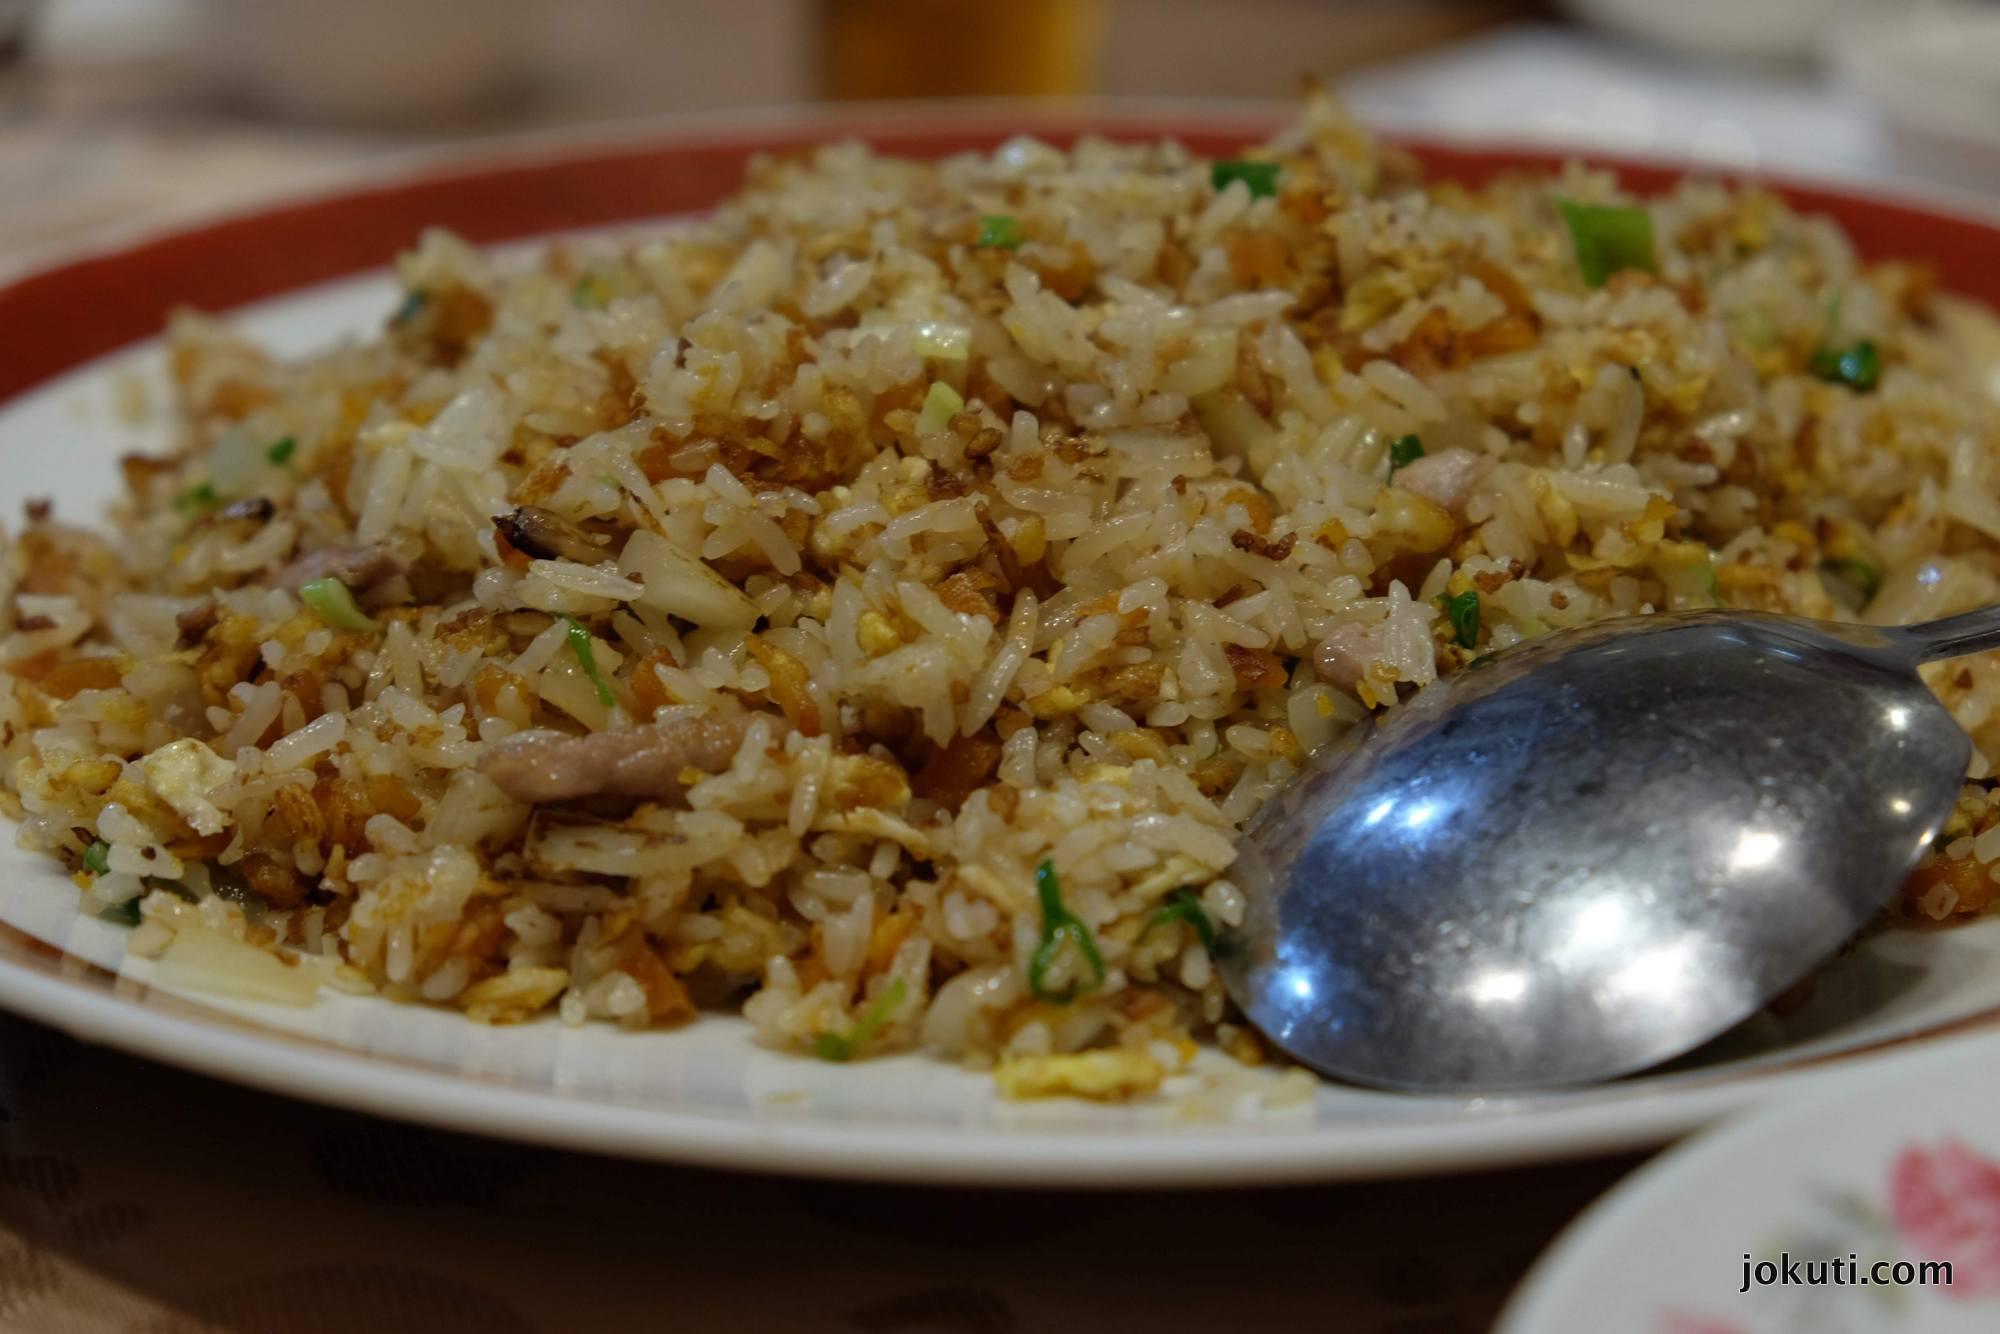 dscf2989_taipei_ming_fu_seafood_michelin_taiwan_vilagevo_jokuti.jpg